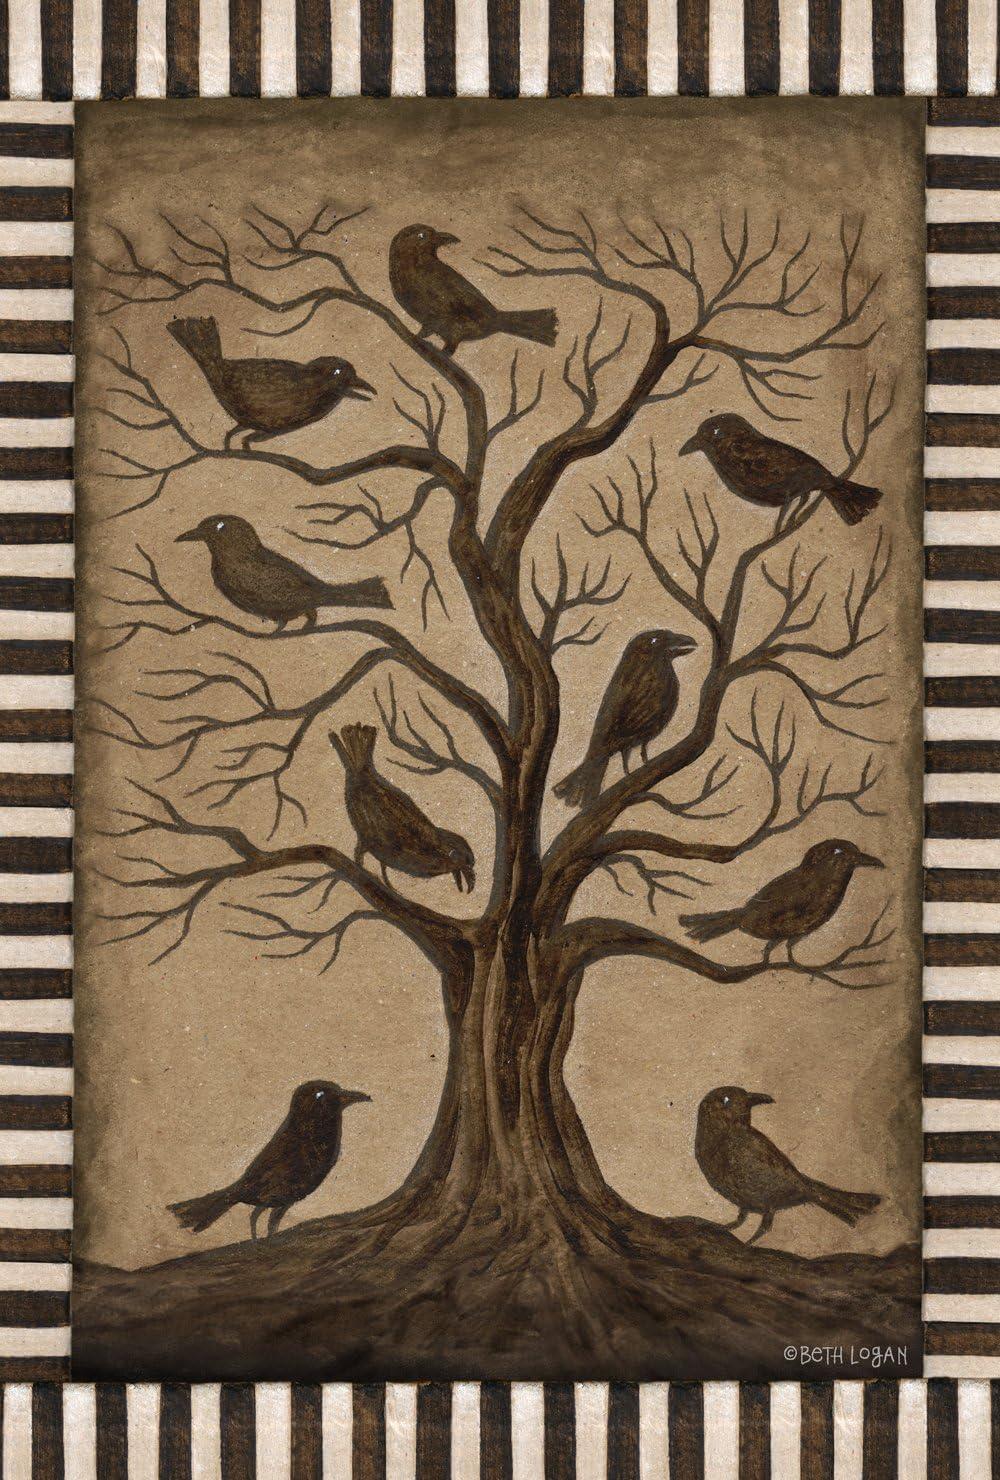 Toland Home Garden Tree Ravens 12.5 x 18 Inch Decorative Rustic Black Bird Spooky Halloween Garden Flag